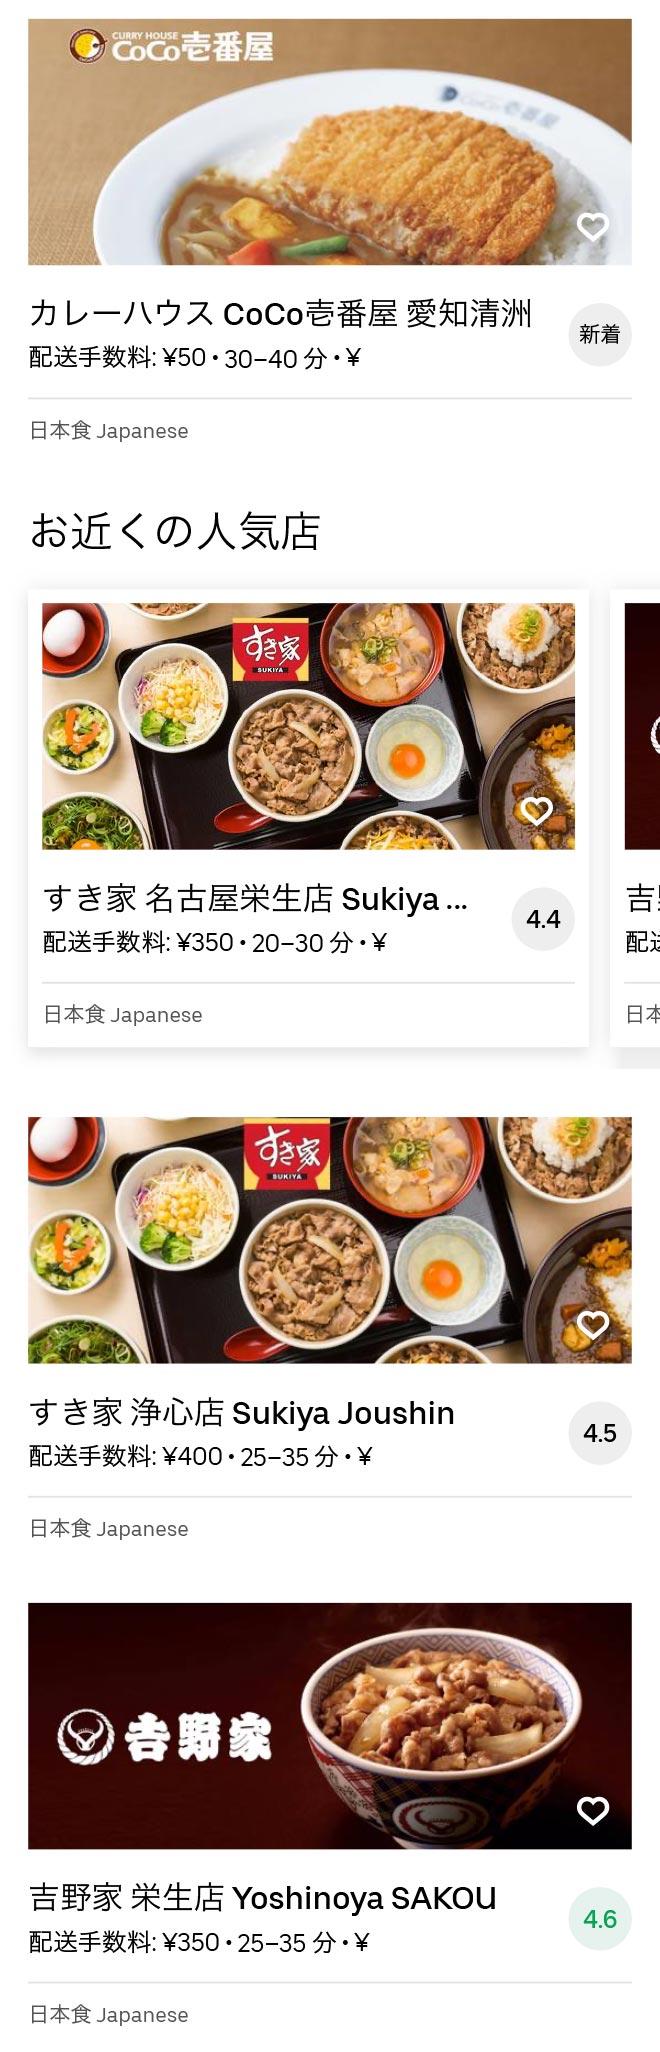 Owari hoshinomiya menu 2008 1